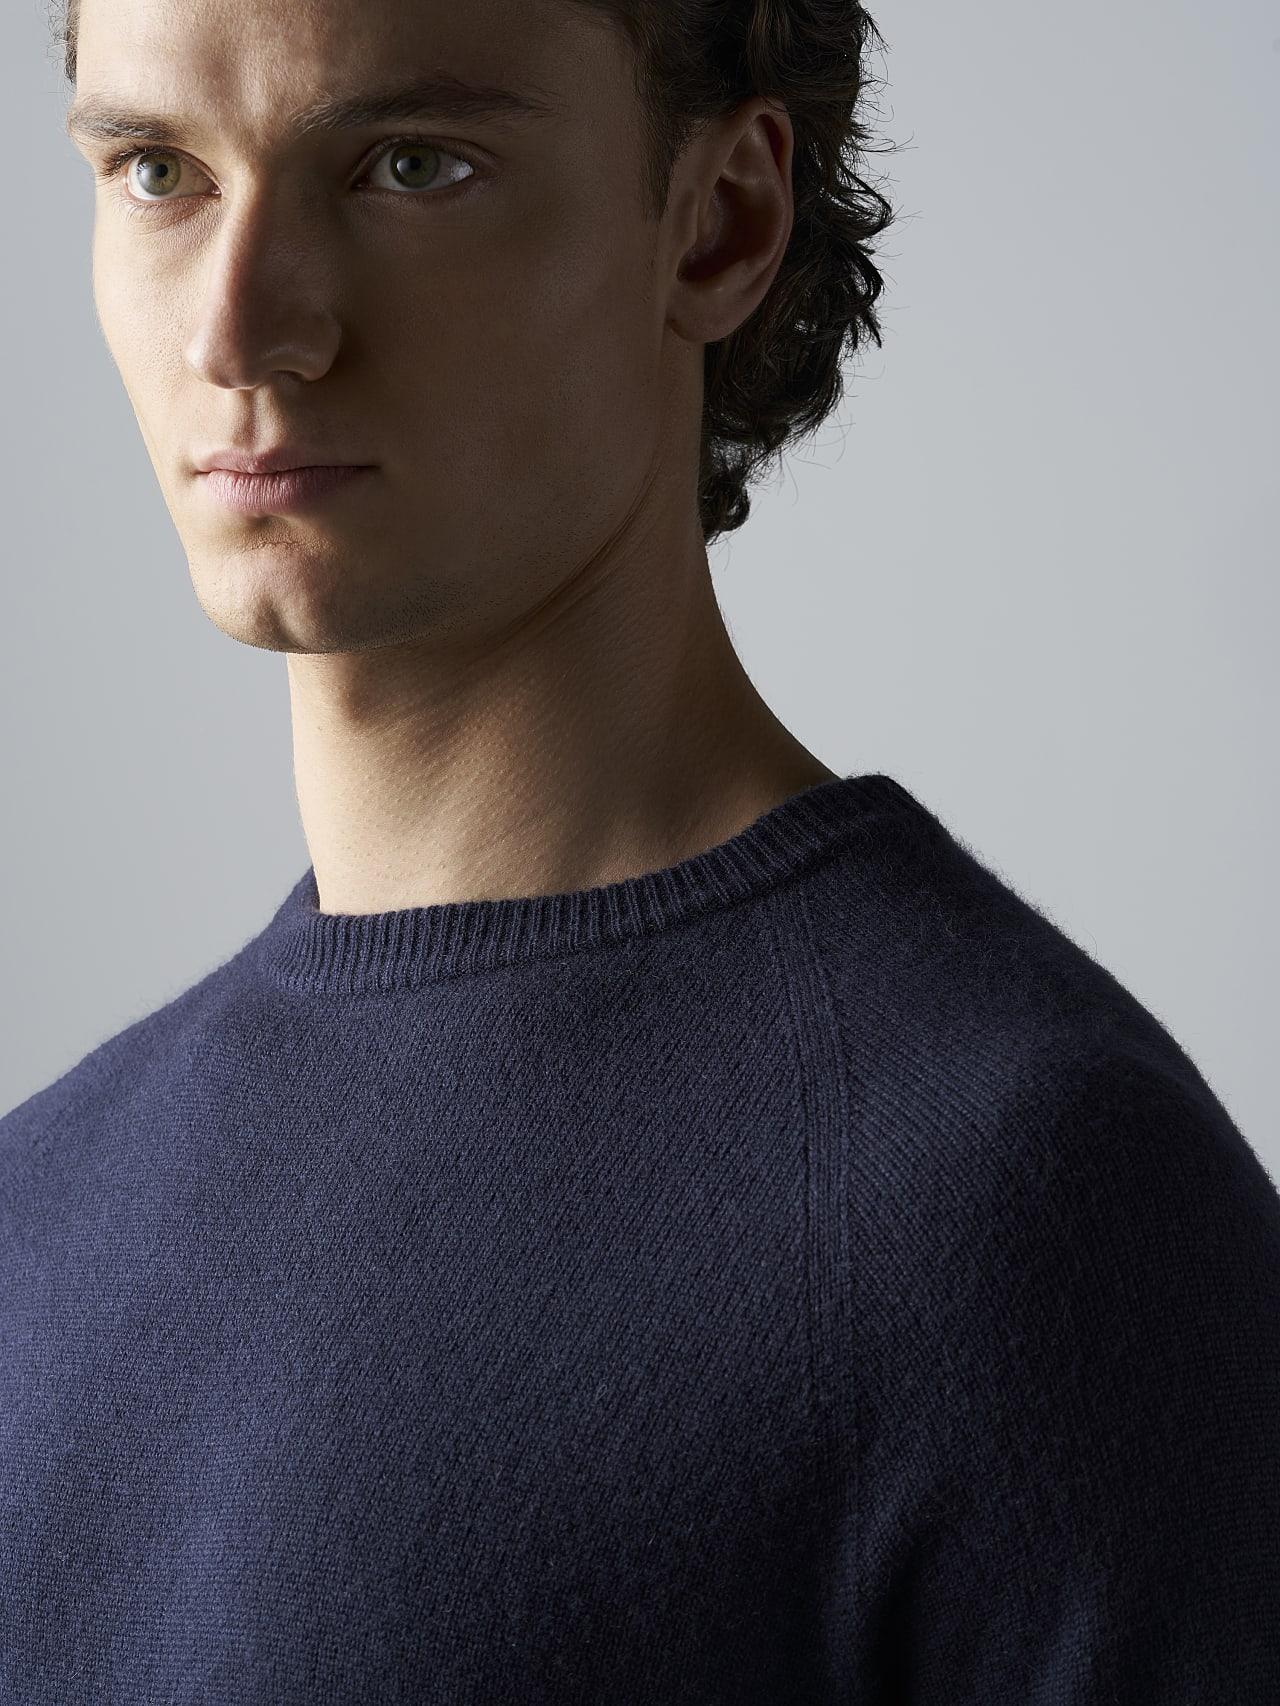 FLACK V2.Y4.02 Premium 3D Knit Merino-Cashmere Jumper navy Right Alpha Tauri